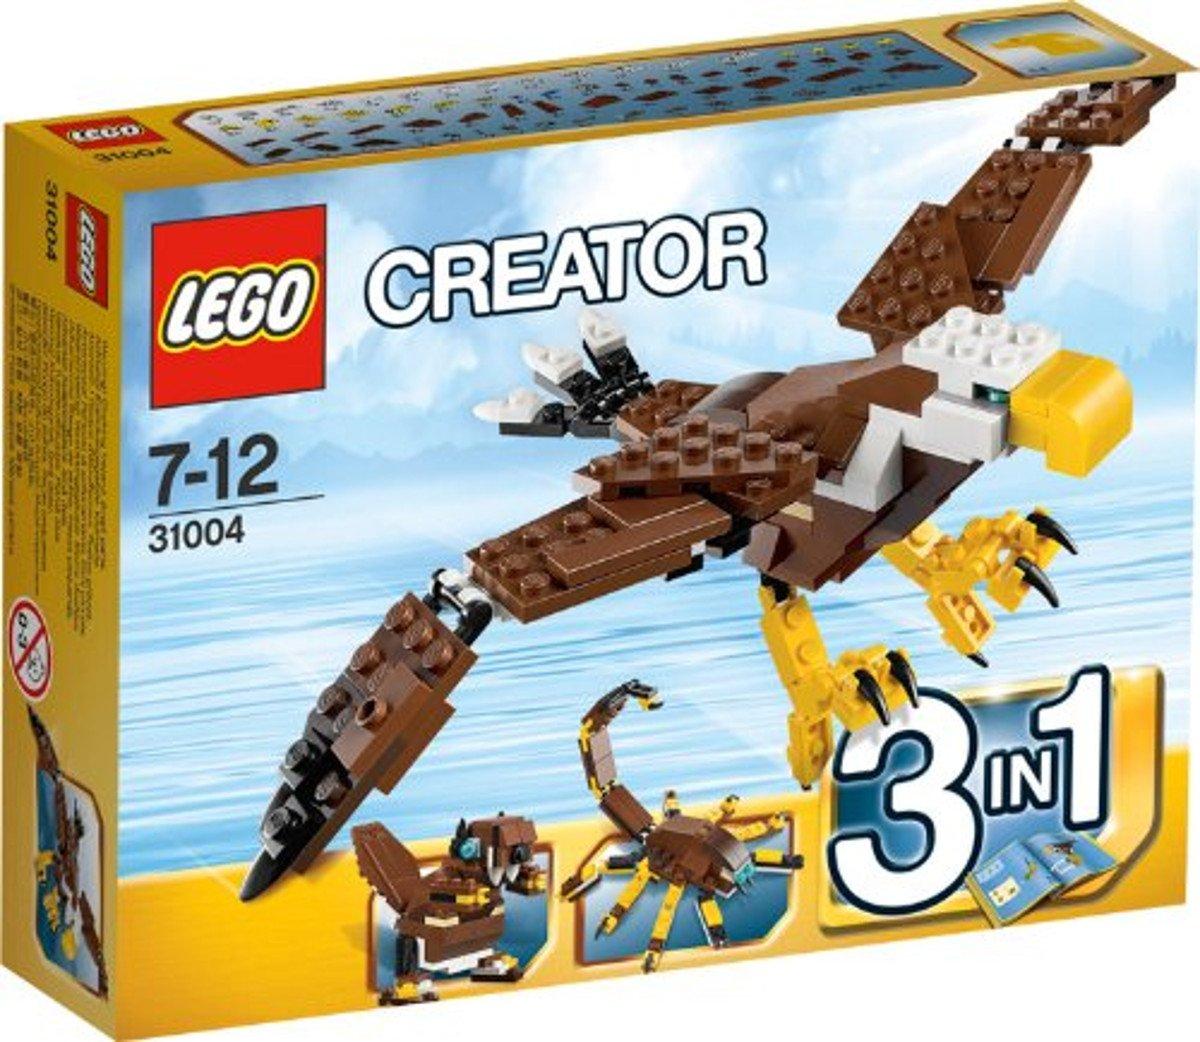 LEGO Creator Creator Creator 31004 - Adler 101881